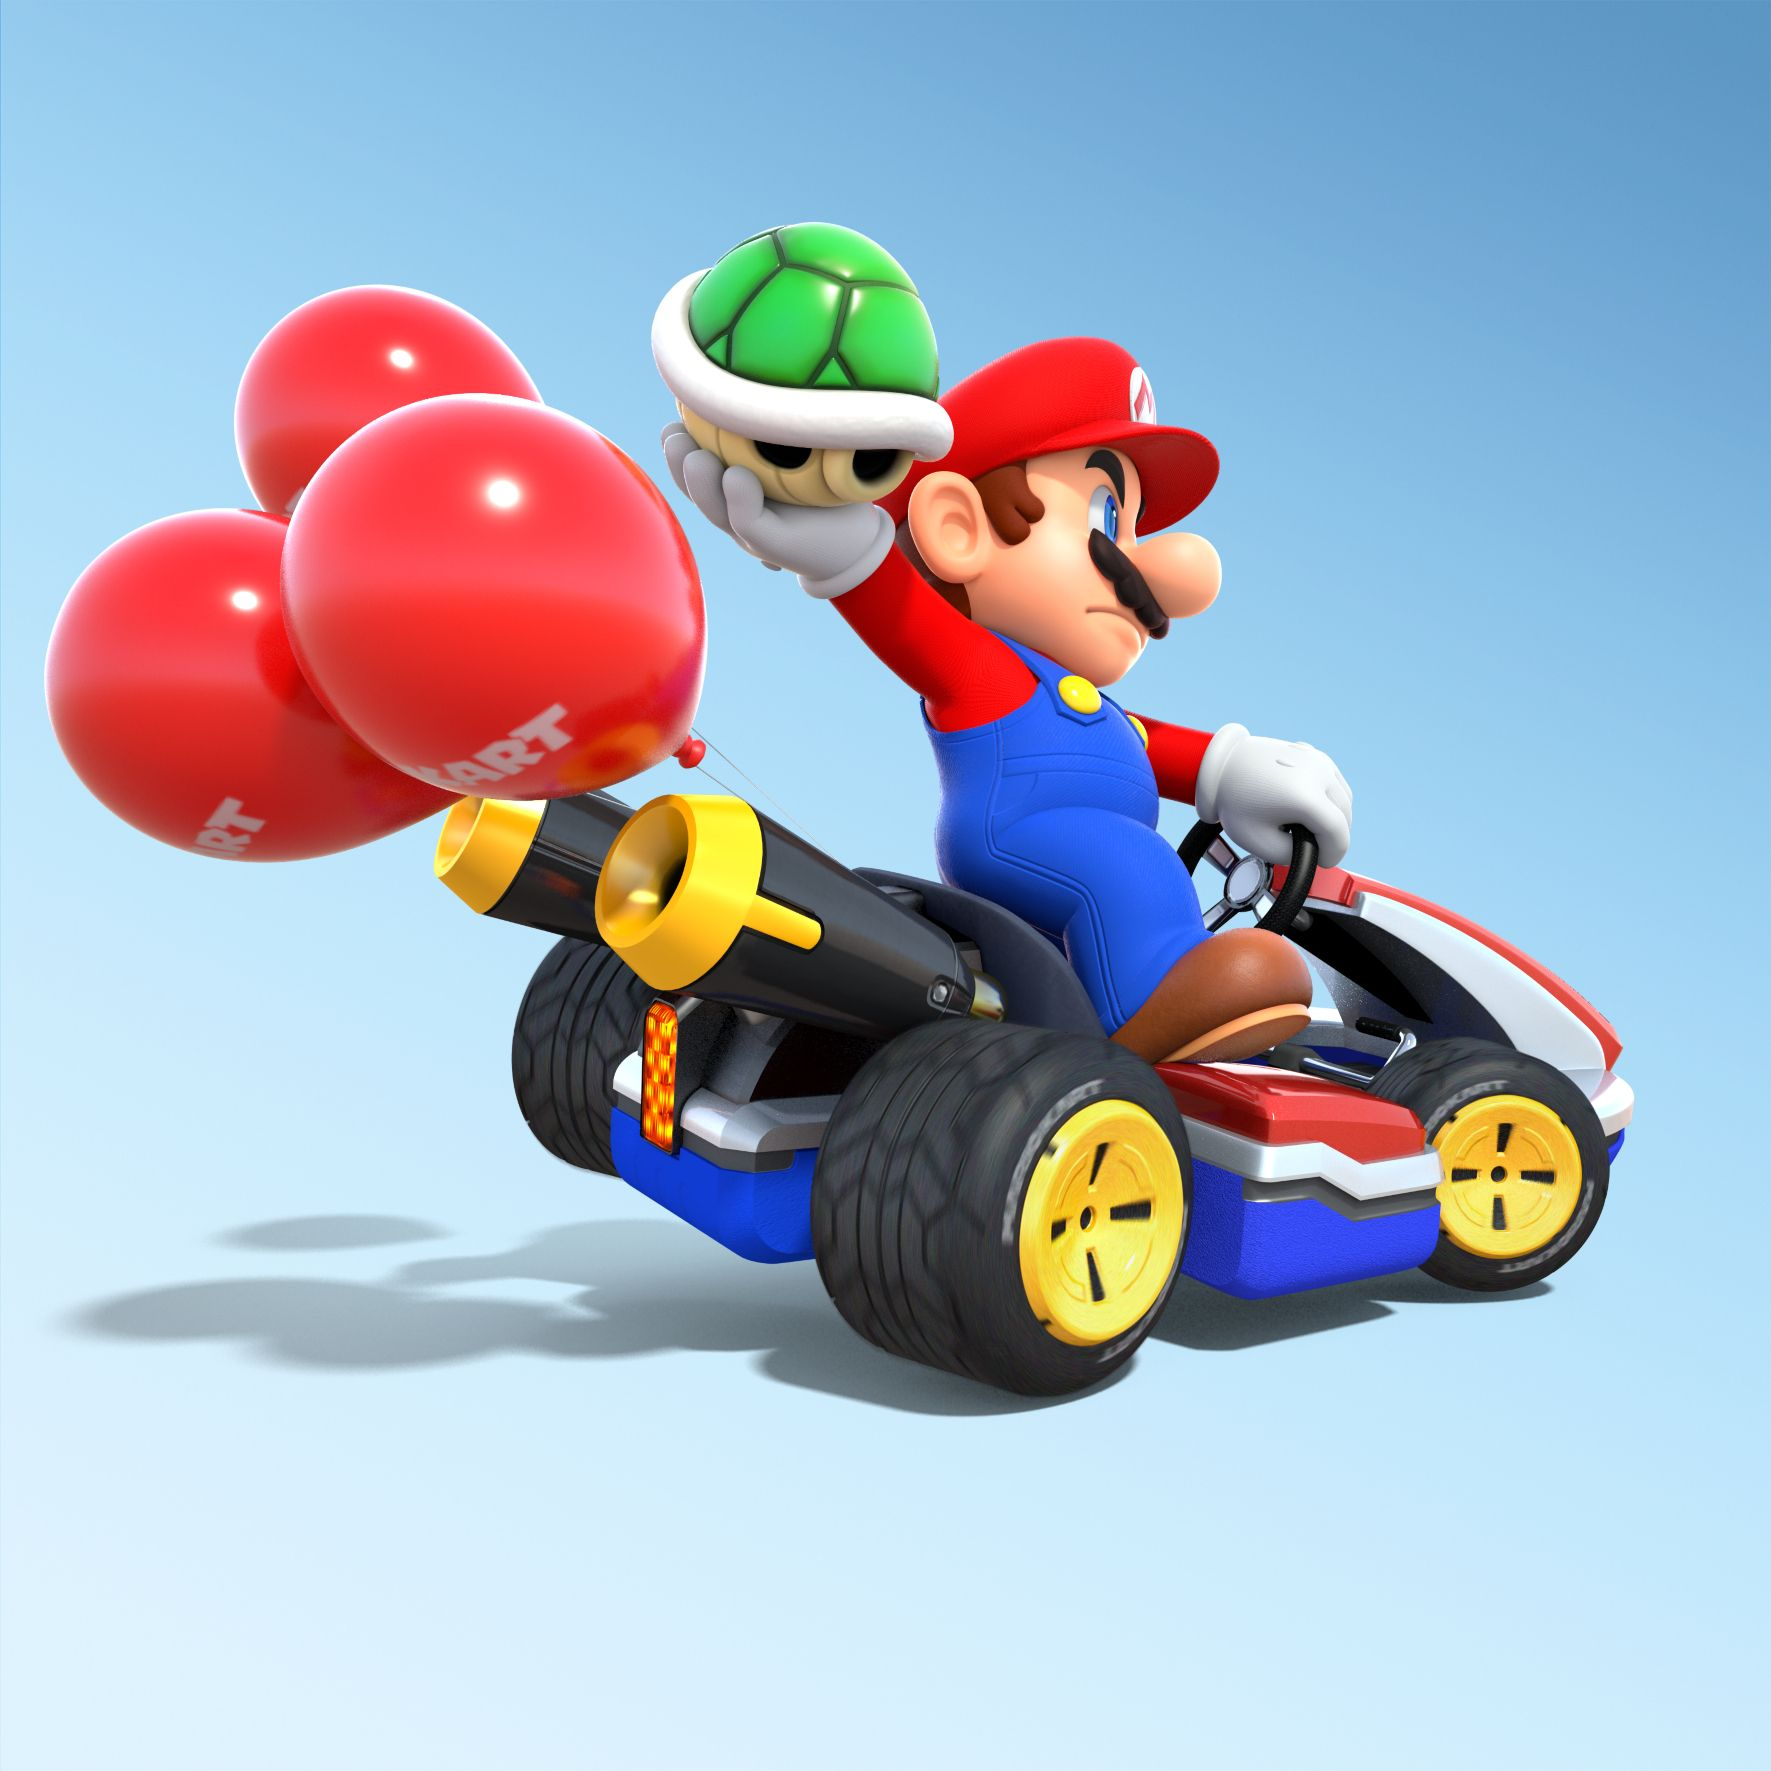 Imgur Mario Kart Mario Kart 8 Nintendo Mario Bros